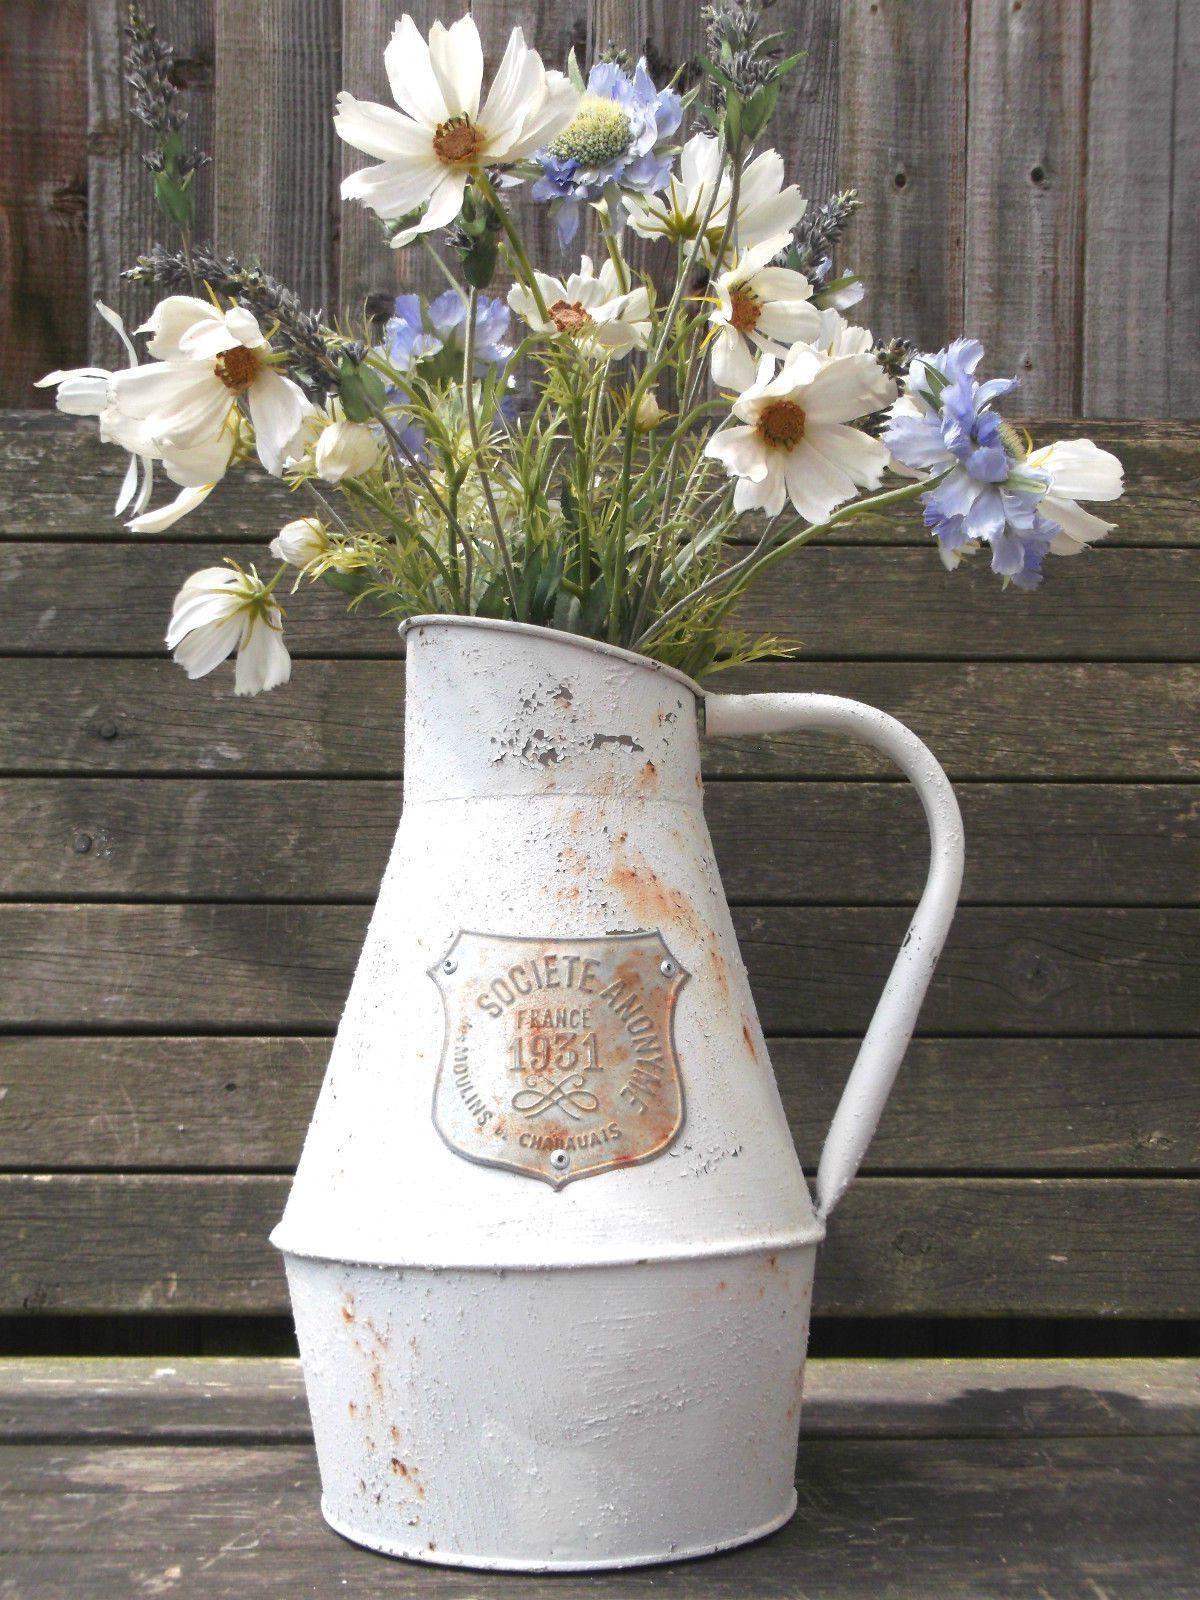 white table vase of 30 copper flower vase the weekly world with french flower bucket h vases galvanized french vase tin bucketi 0d